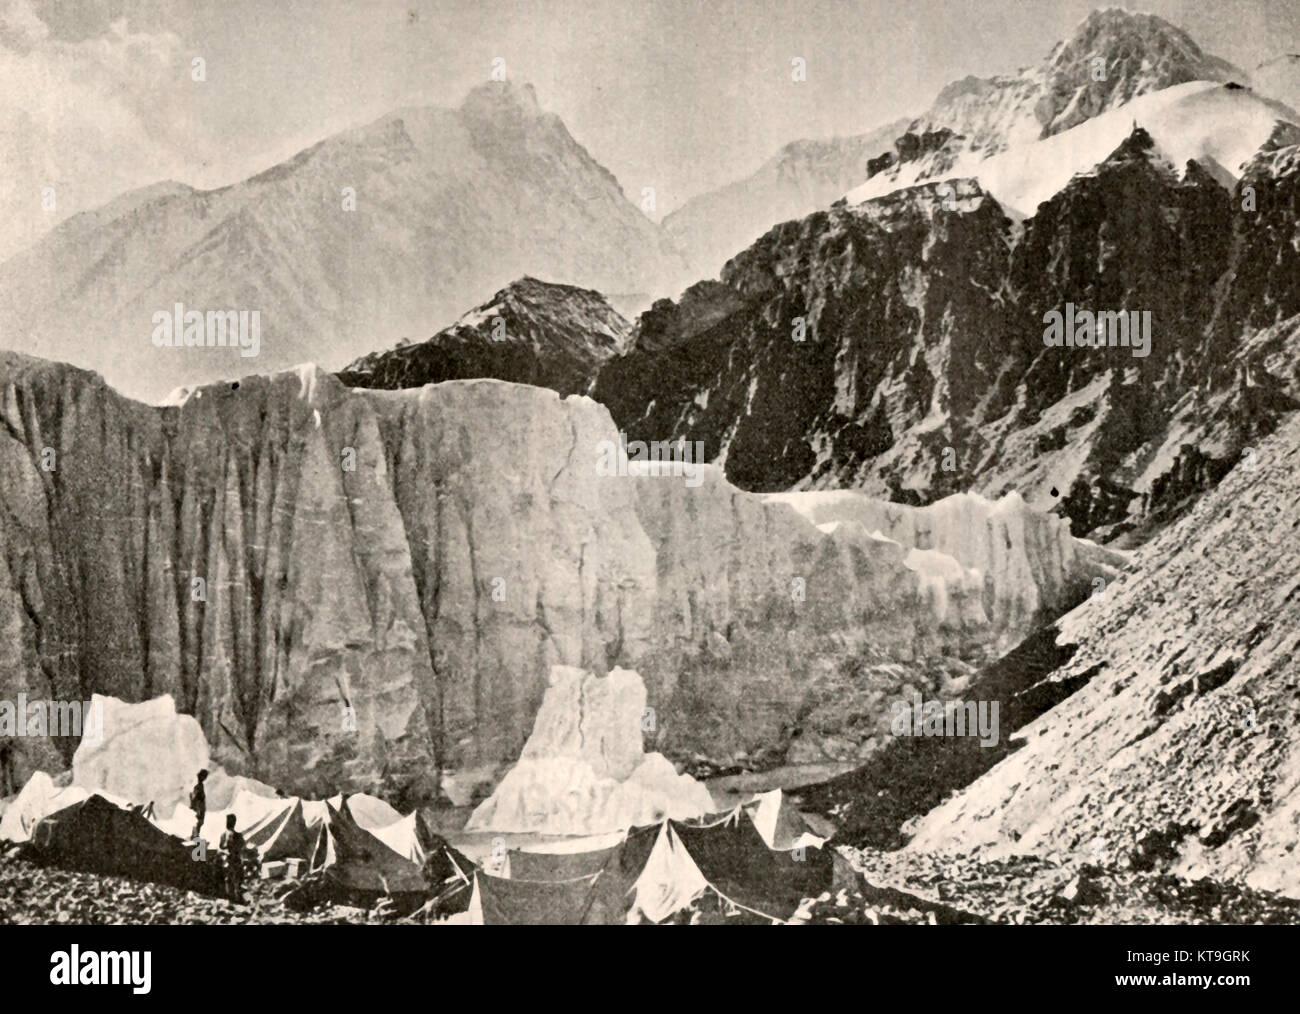 EVEREST - British climbers tents at the foot of Mount Everest (aka Sagarmāthā  and  Chomolungma, Himalayas in 1932. - Stock Image